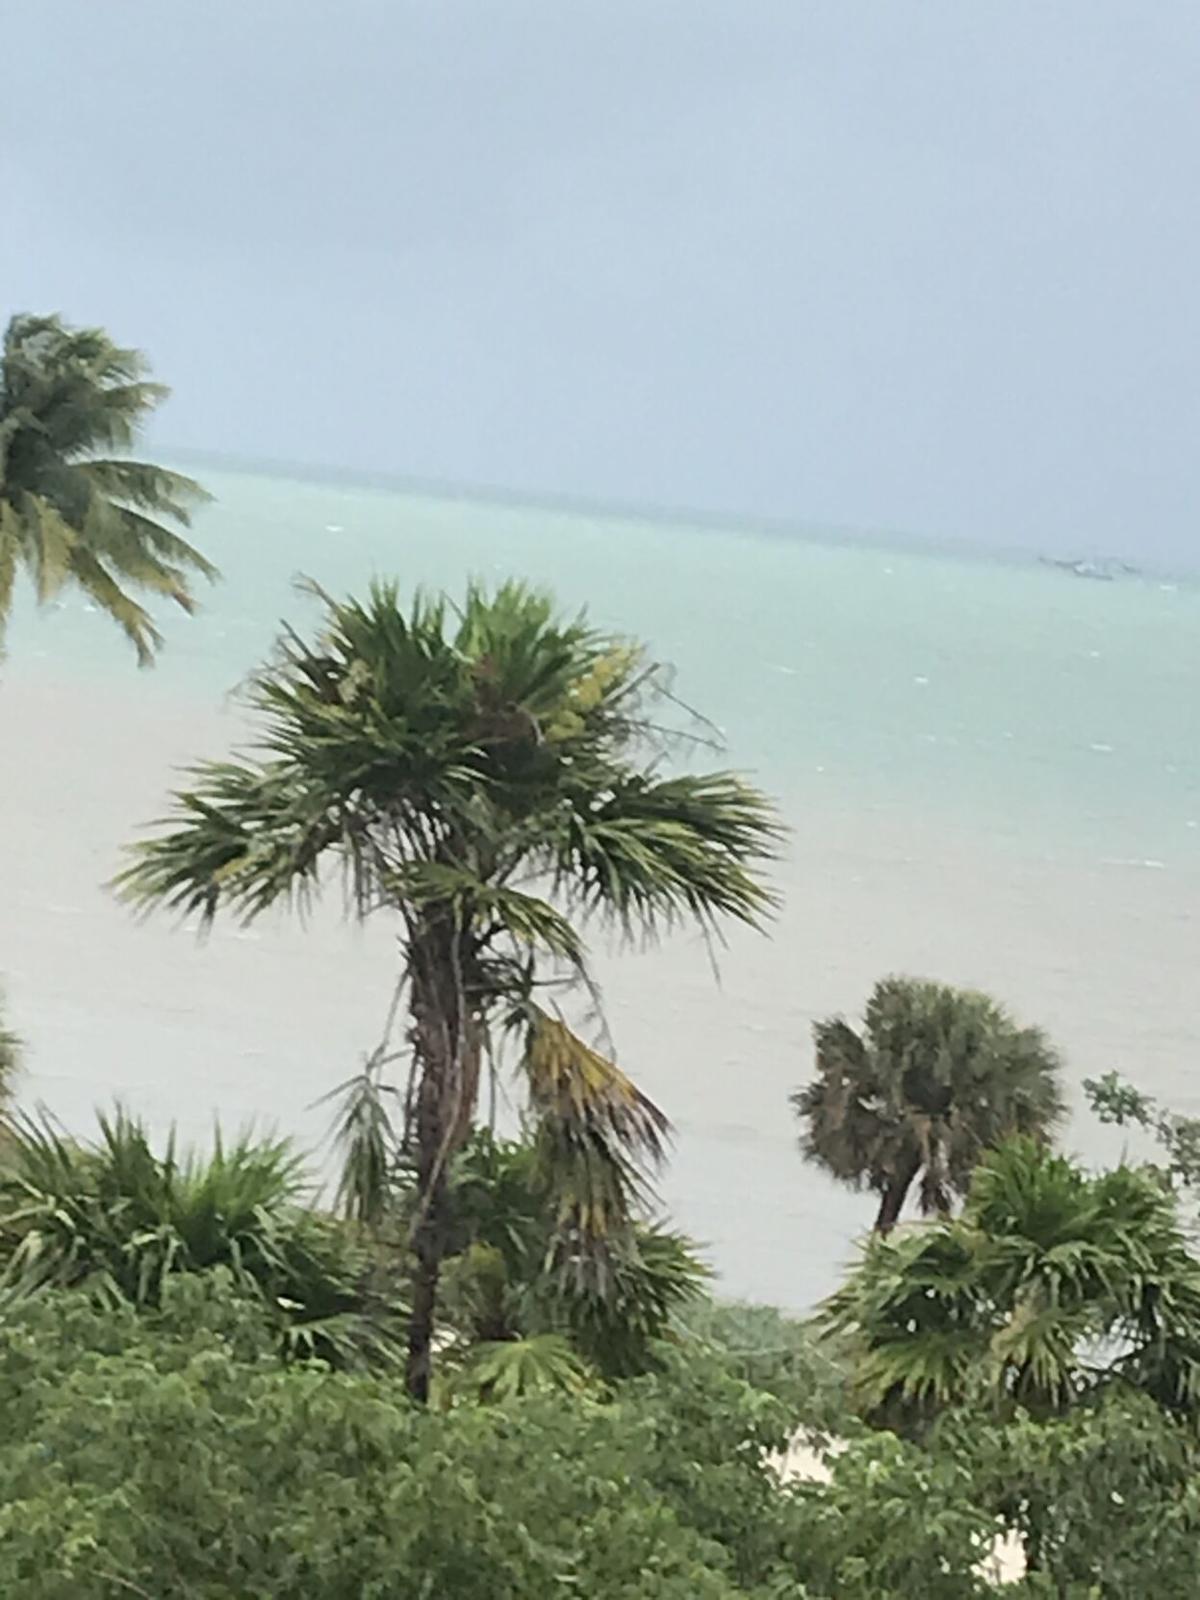 2020.10.24 kh robinson palms rustle.jpg